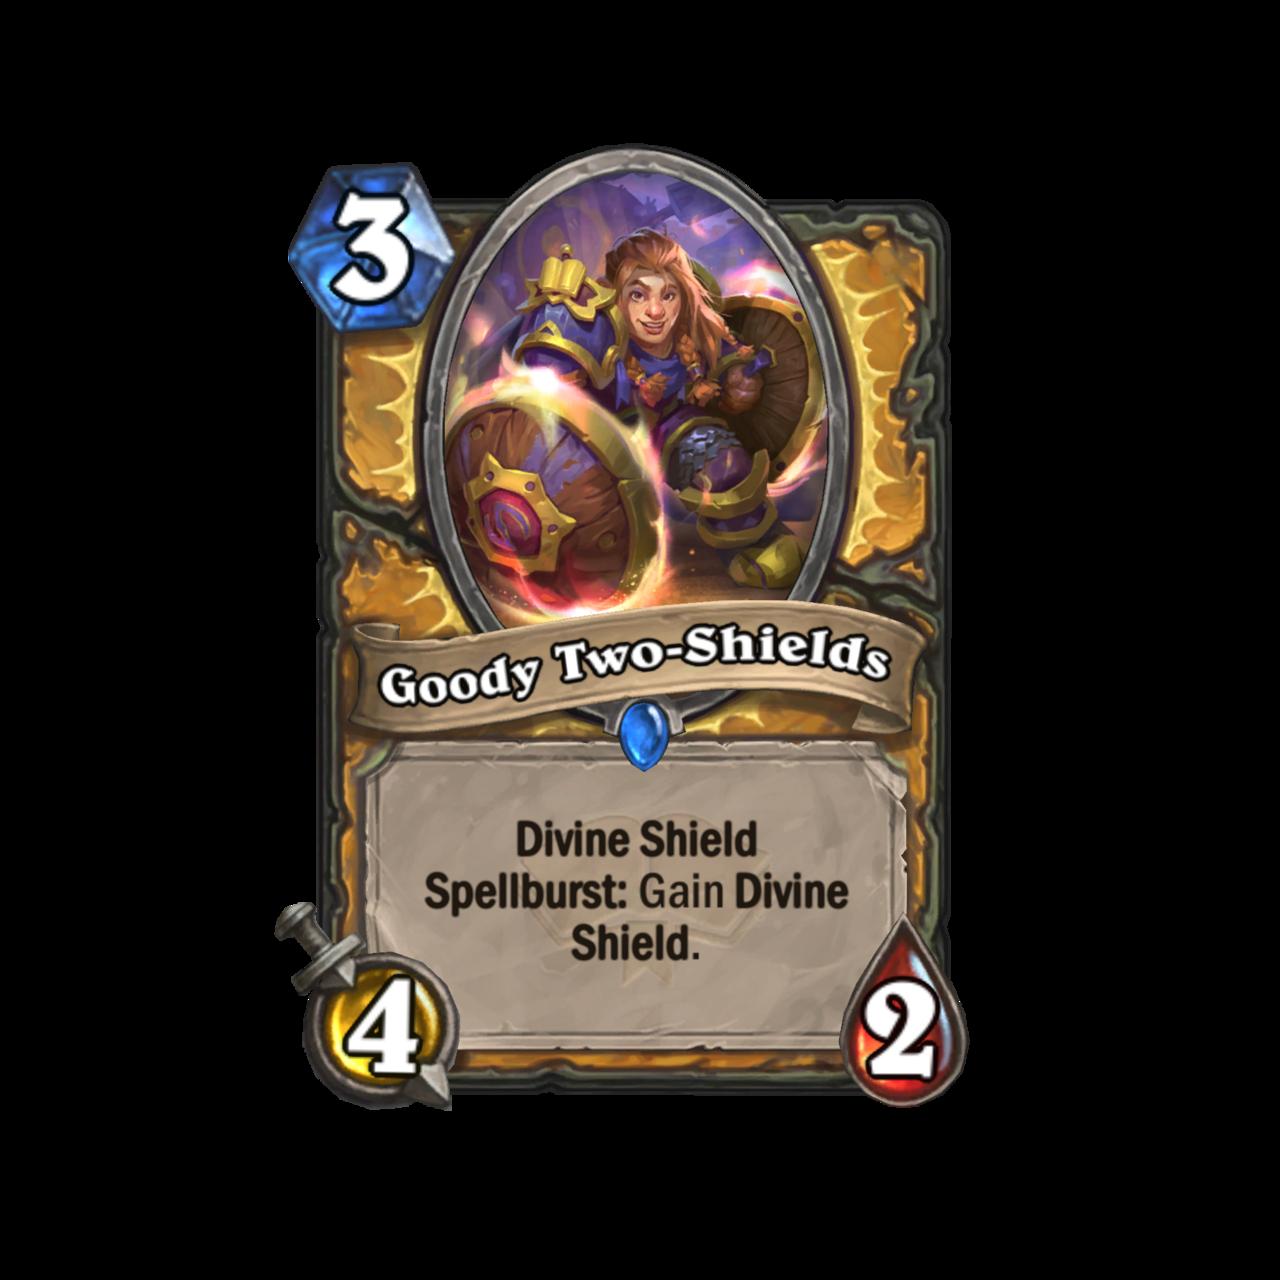 Goody Two-Shields shows Spellburst effect